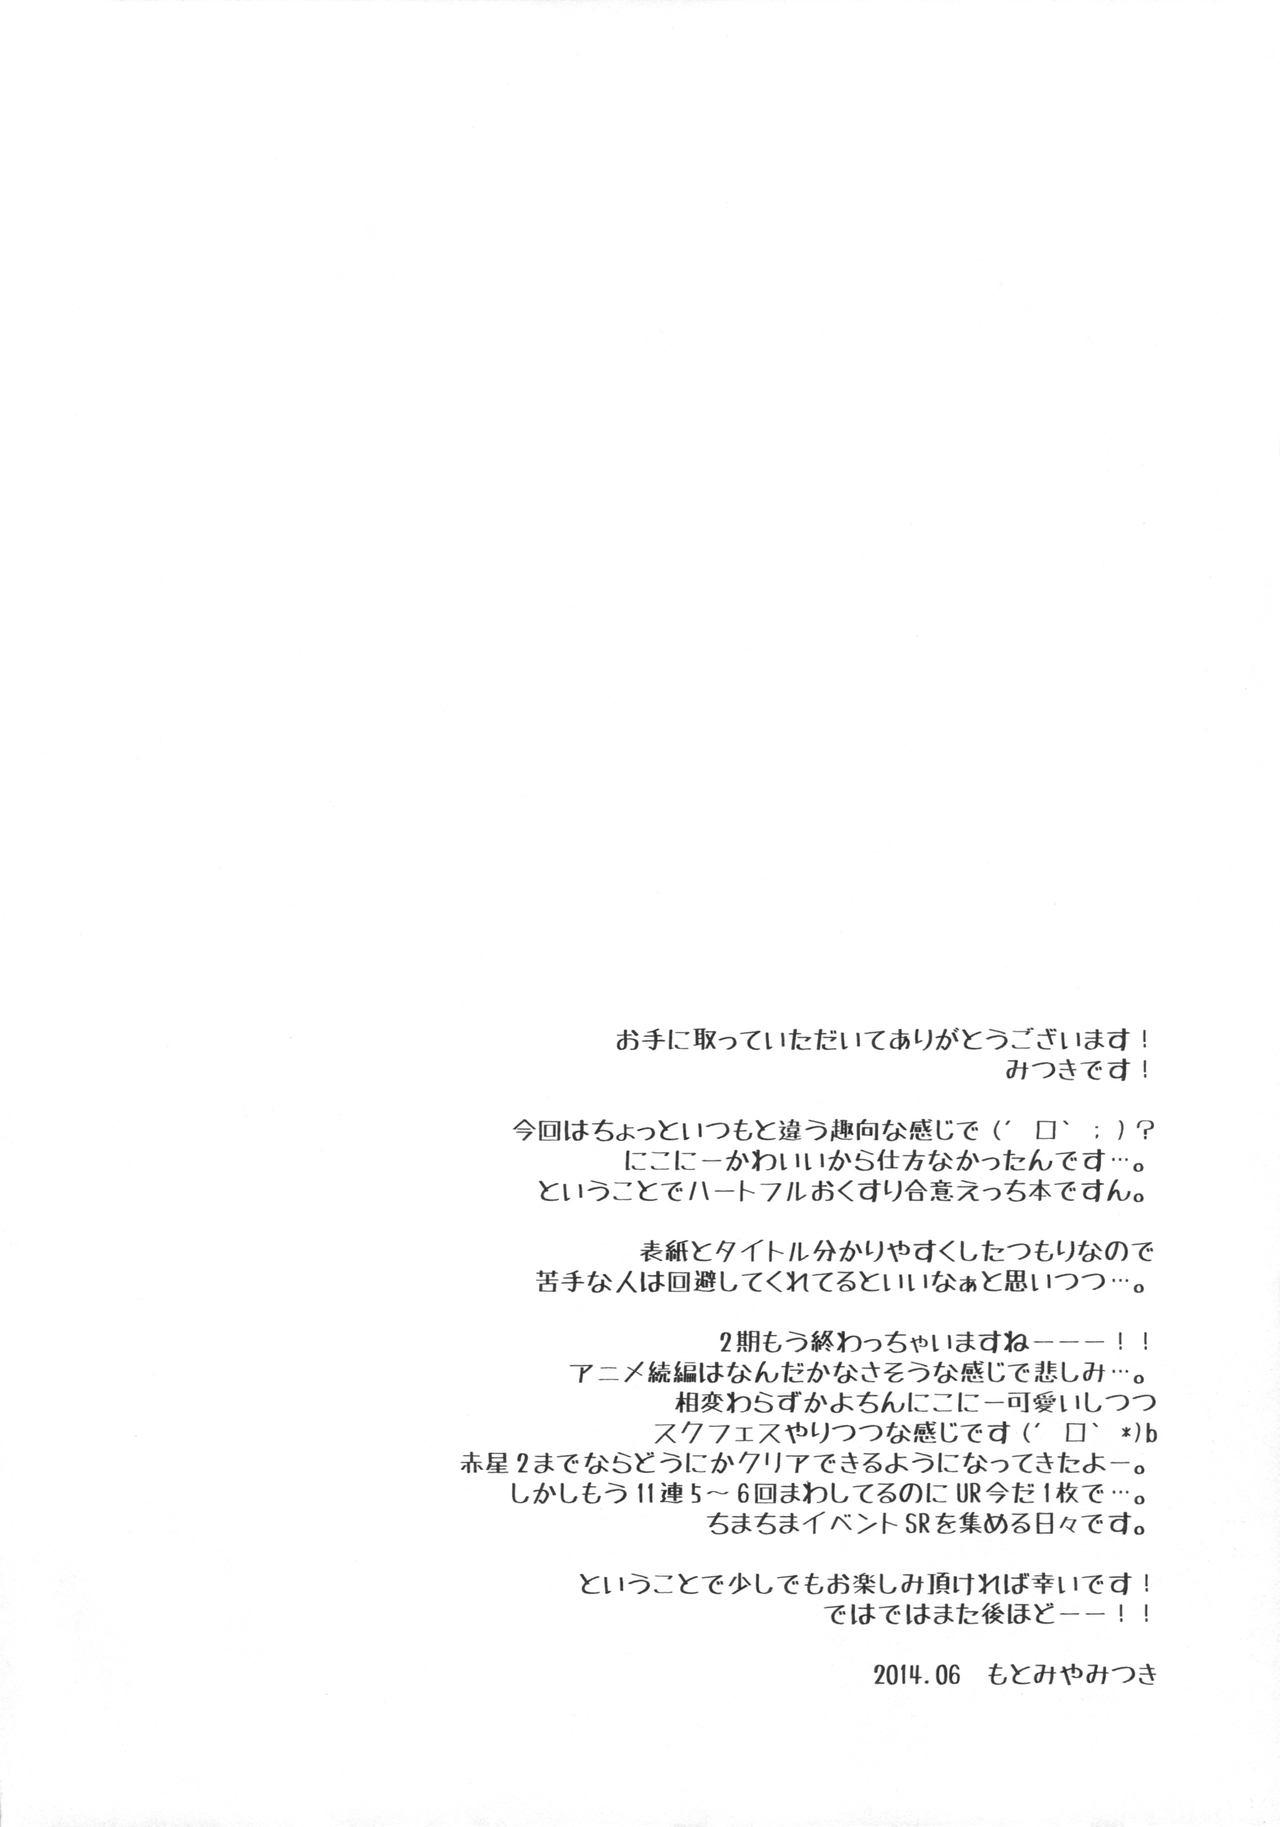 (SC64) [FRAC (Motomiya Mitsuki)] Nico Satsu - Nico-nii Okusuri Ecchi - (Love Live!) [Chinese] [嗶咔嗶咔漢化組] 2